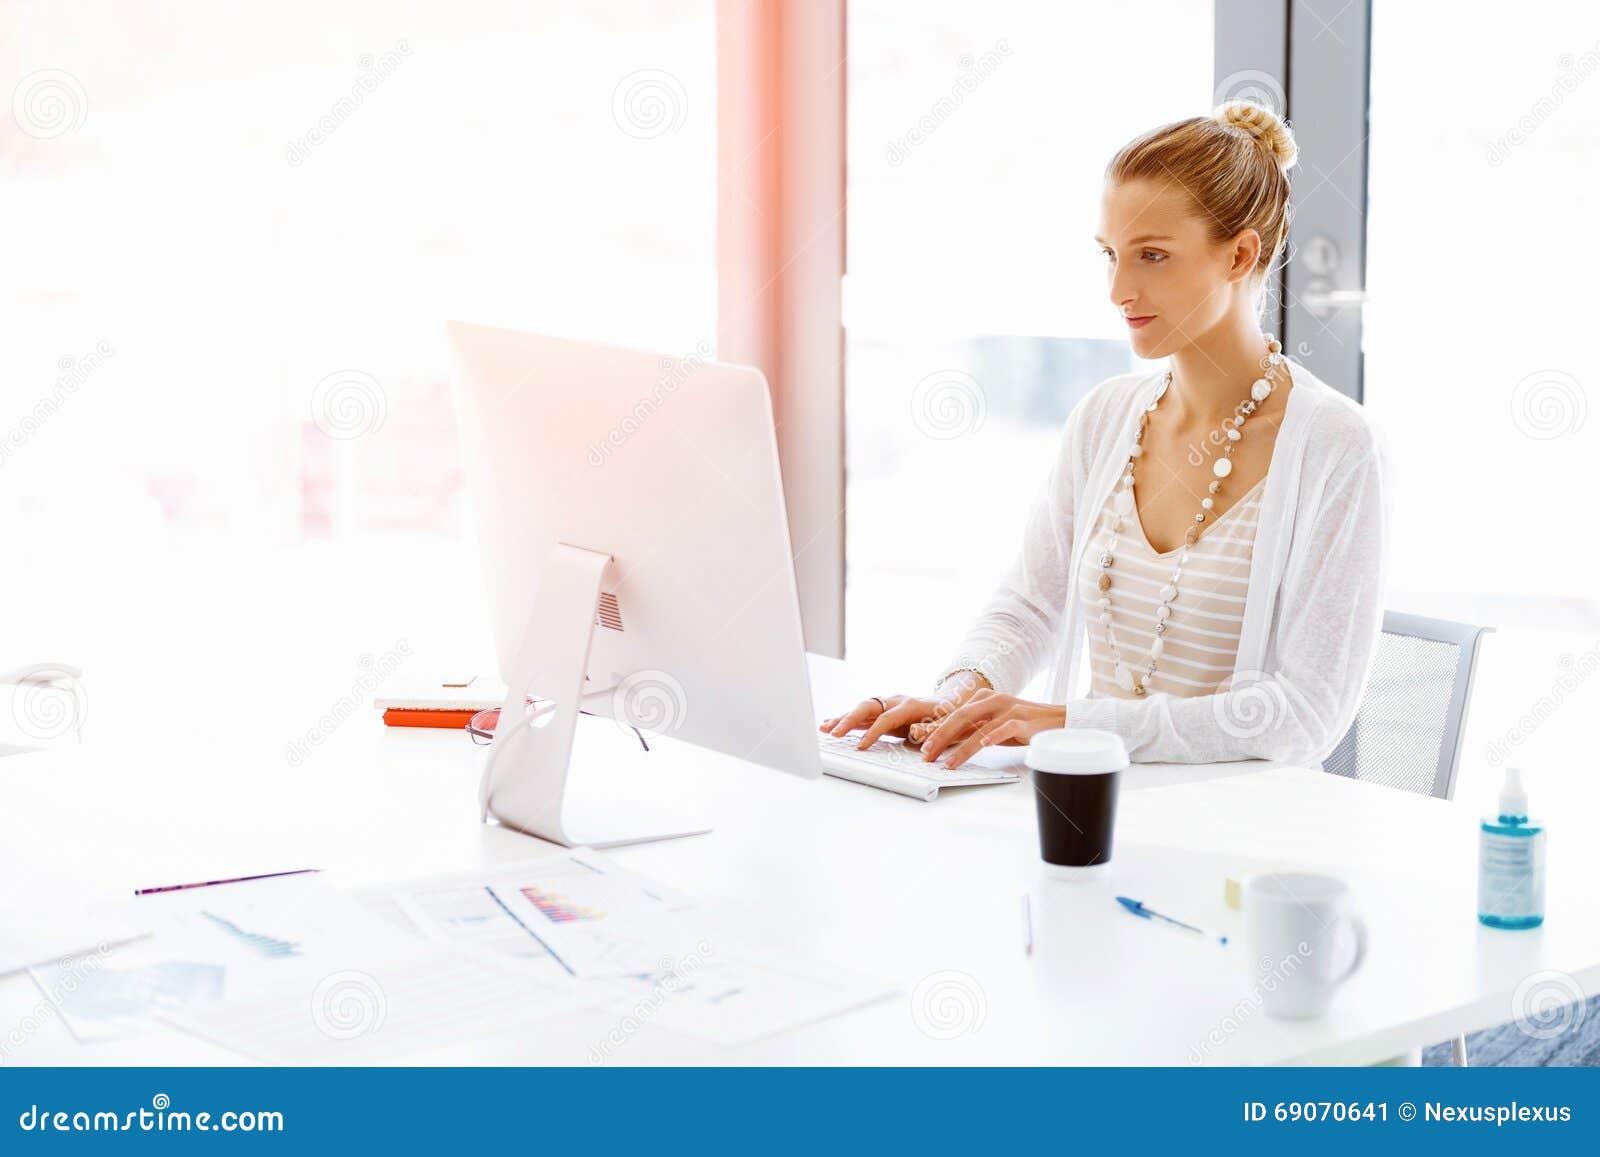 employ de bureau attirant s 39 asseyant au bureau photo stock image 69070641. Black Bedroom Furniture Sets. Home Design Ideas